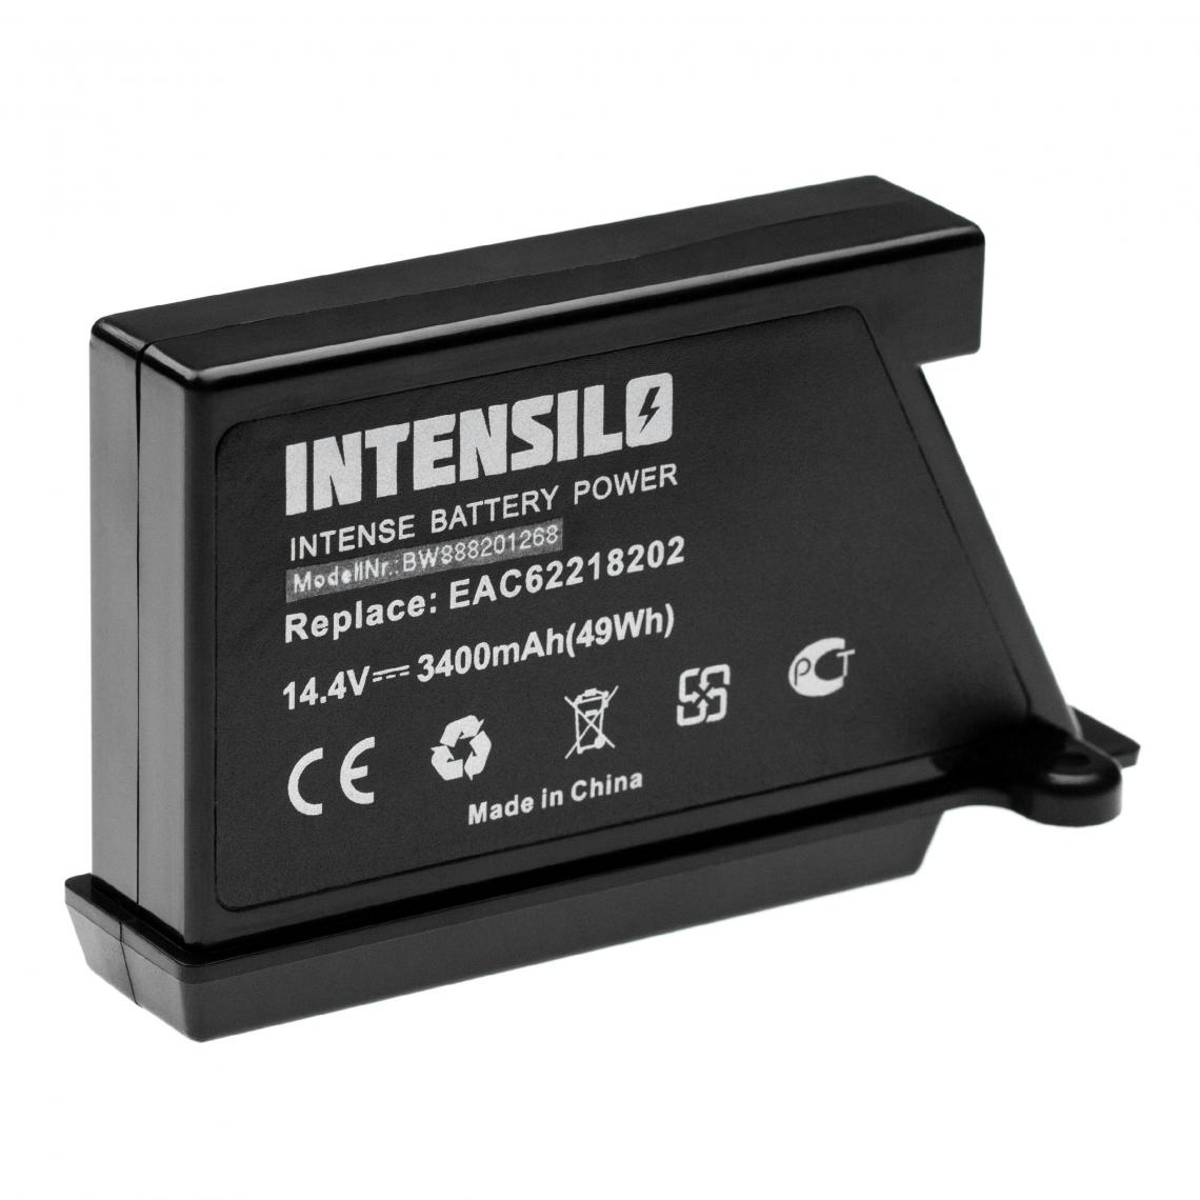 Vhbw INTENSILO Batterie compatible avec LG HOM-BOT VR63455LV, VR63475, VR63475LV robot électroménager (3400mAh, 14,4V, Li-ion